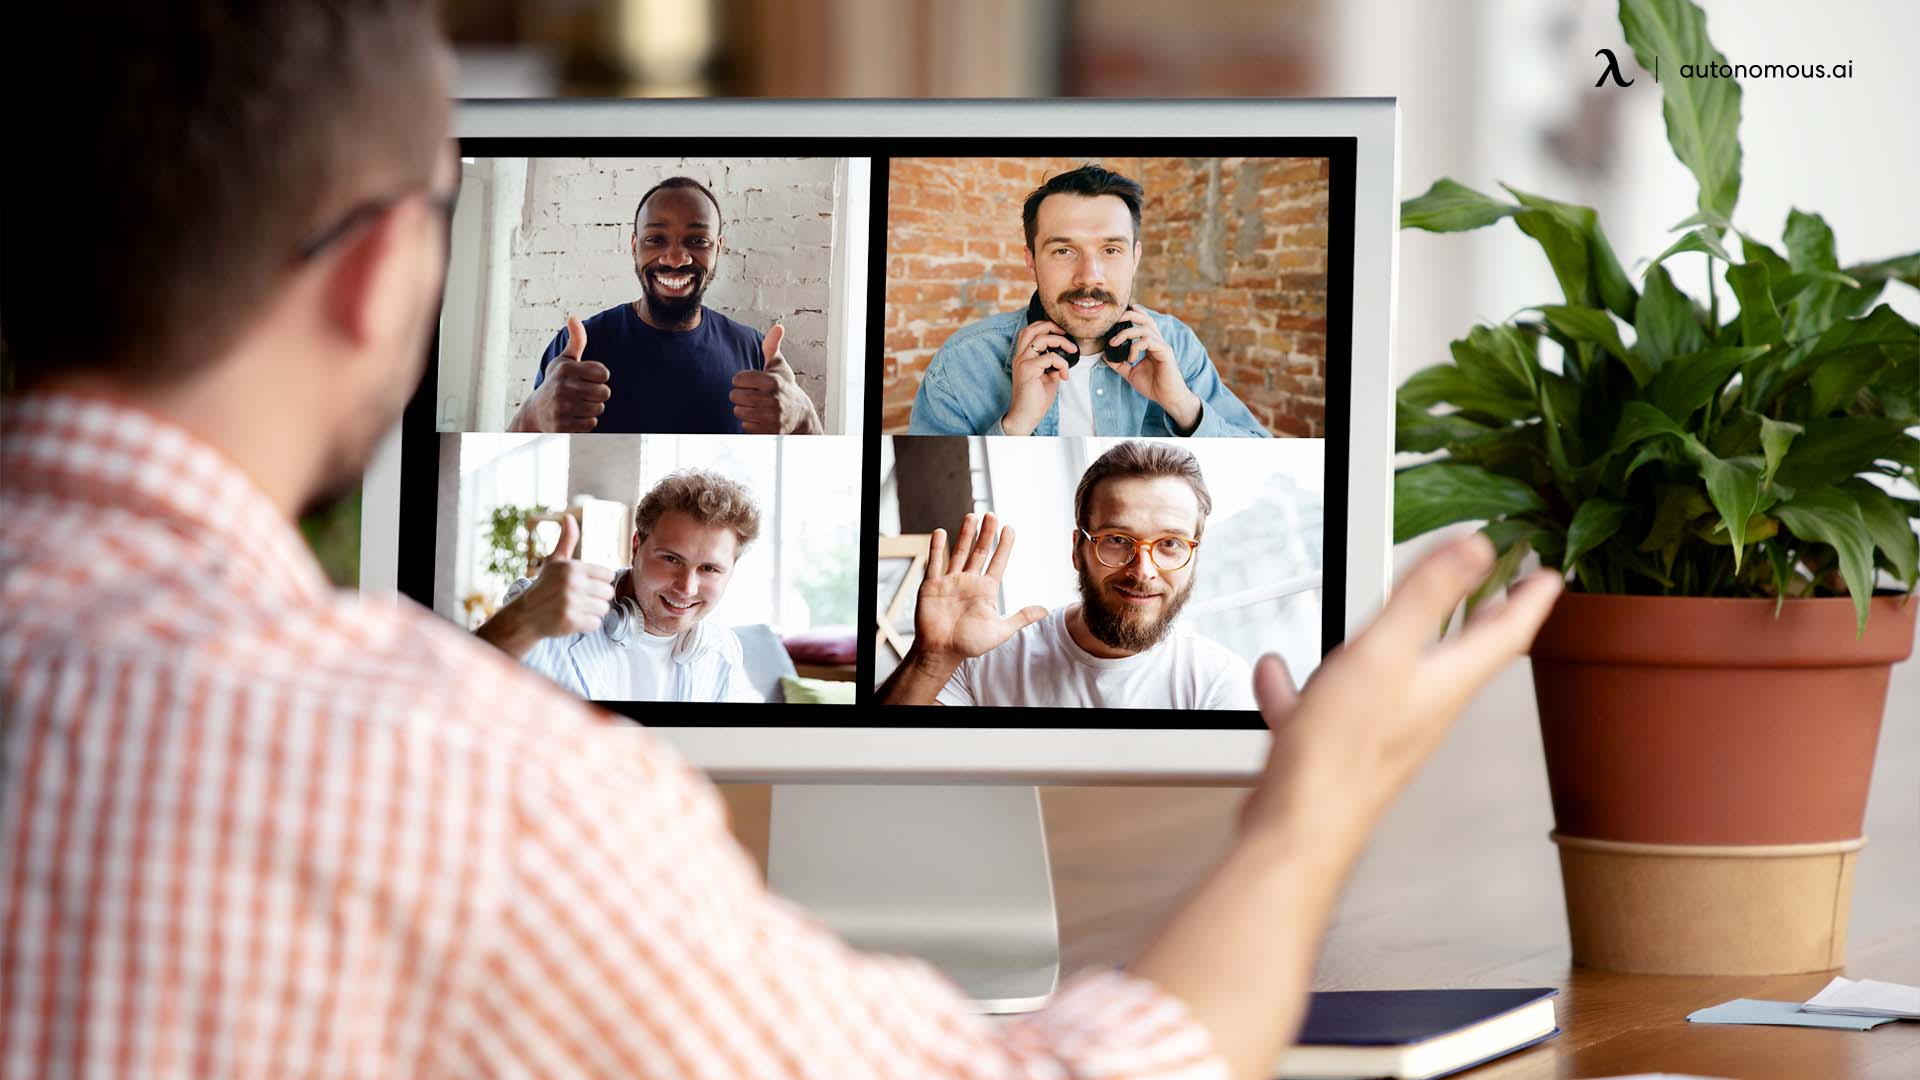 Make Remote Working Fun